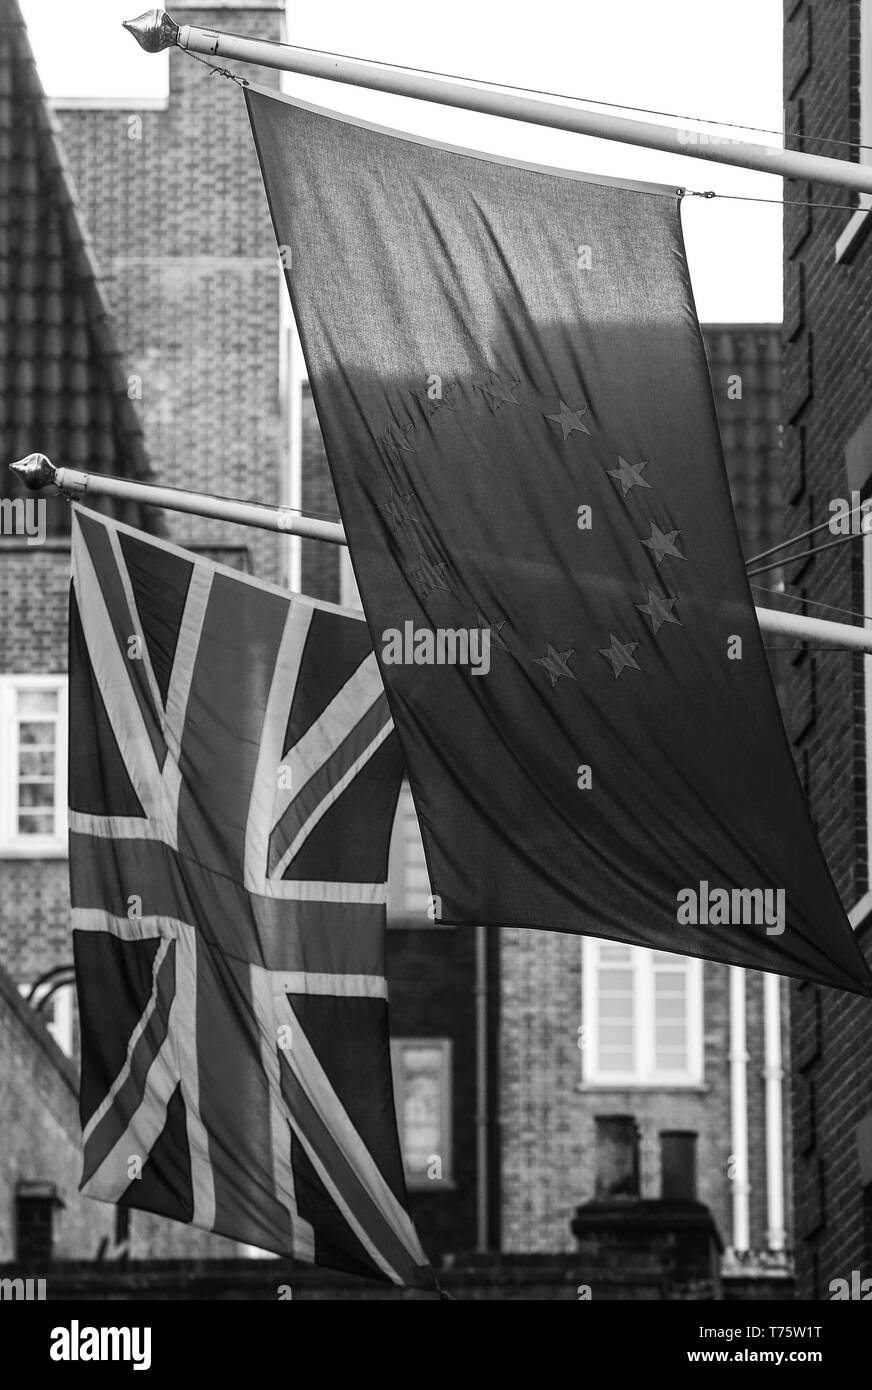 A British Union flag, AKA Union Jack, flies with the European Union (EU) flag, are seen outside Europa House. London, U.K. - Stock Image